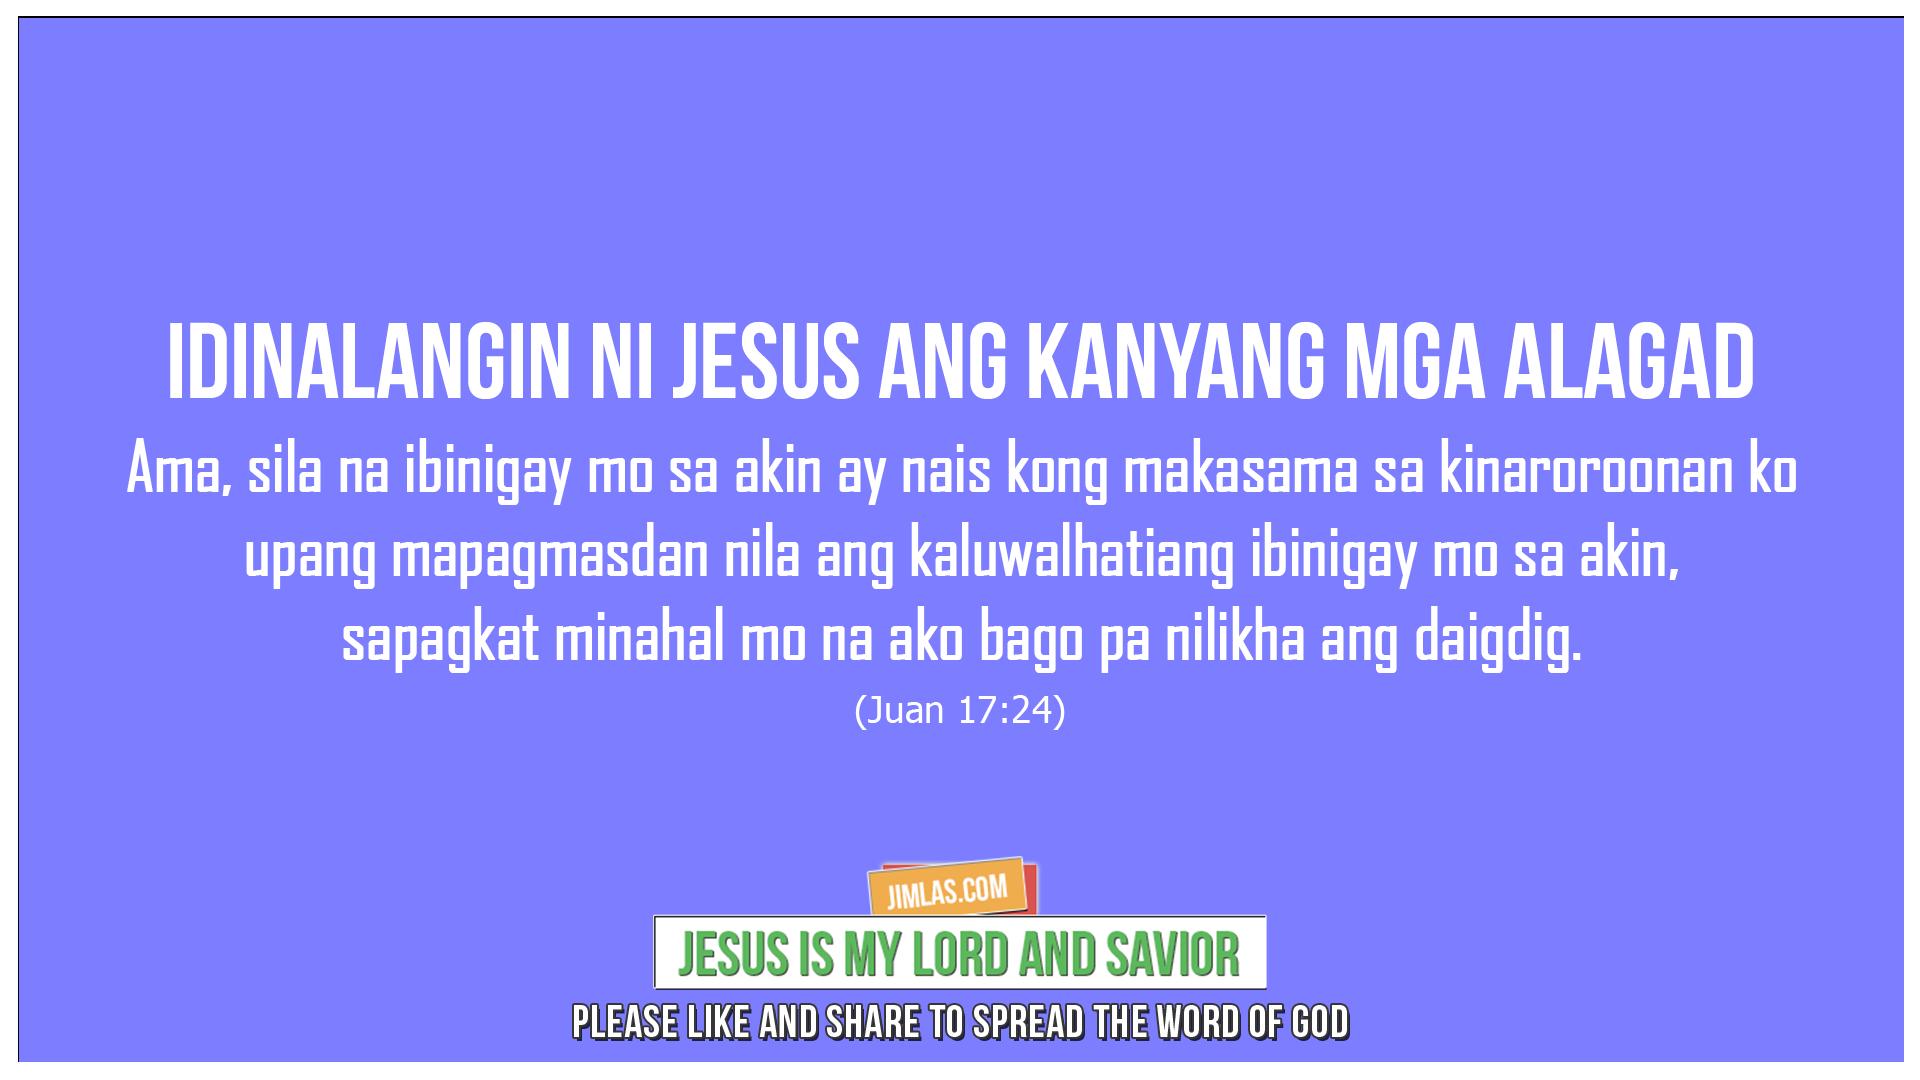 Juan 17:24, Juan 17:24